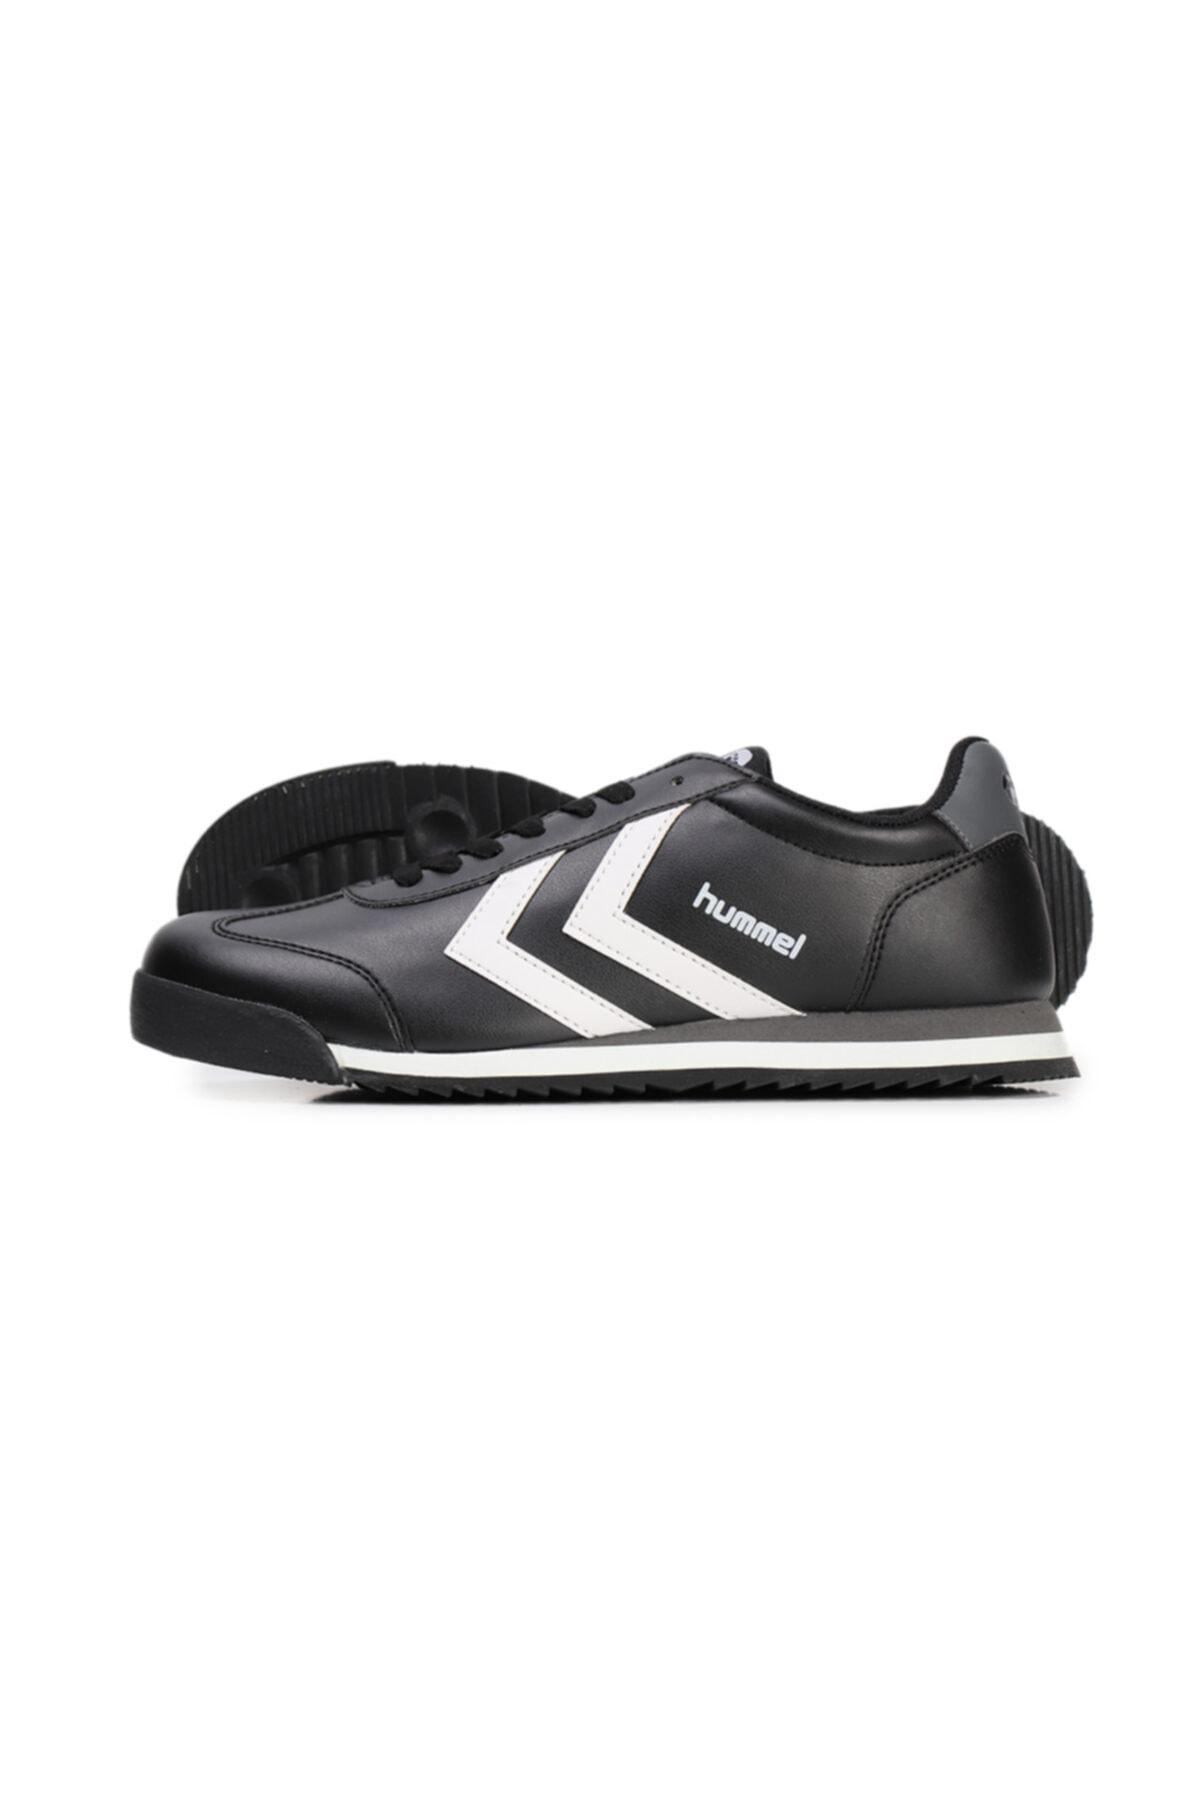 HUMMEL Messmer 23 Ayakkabı 1